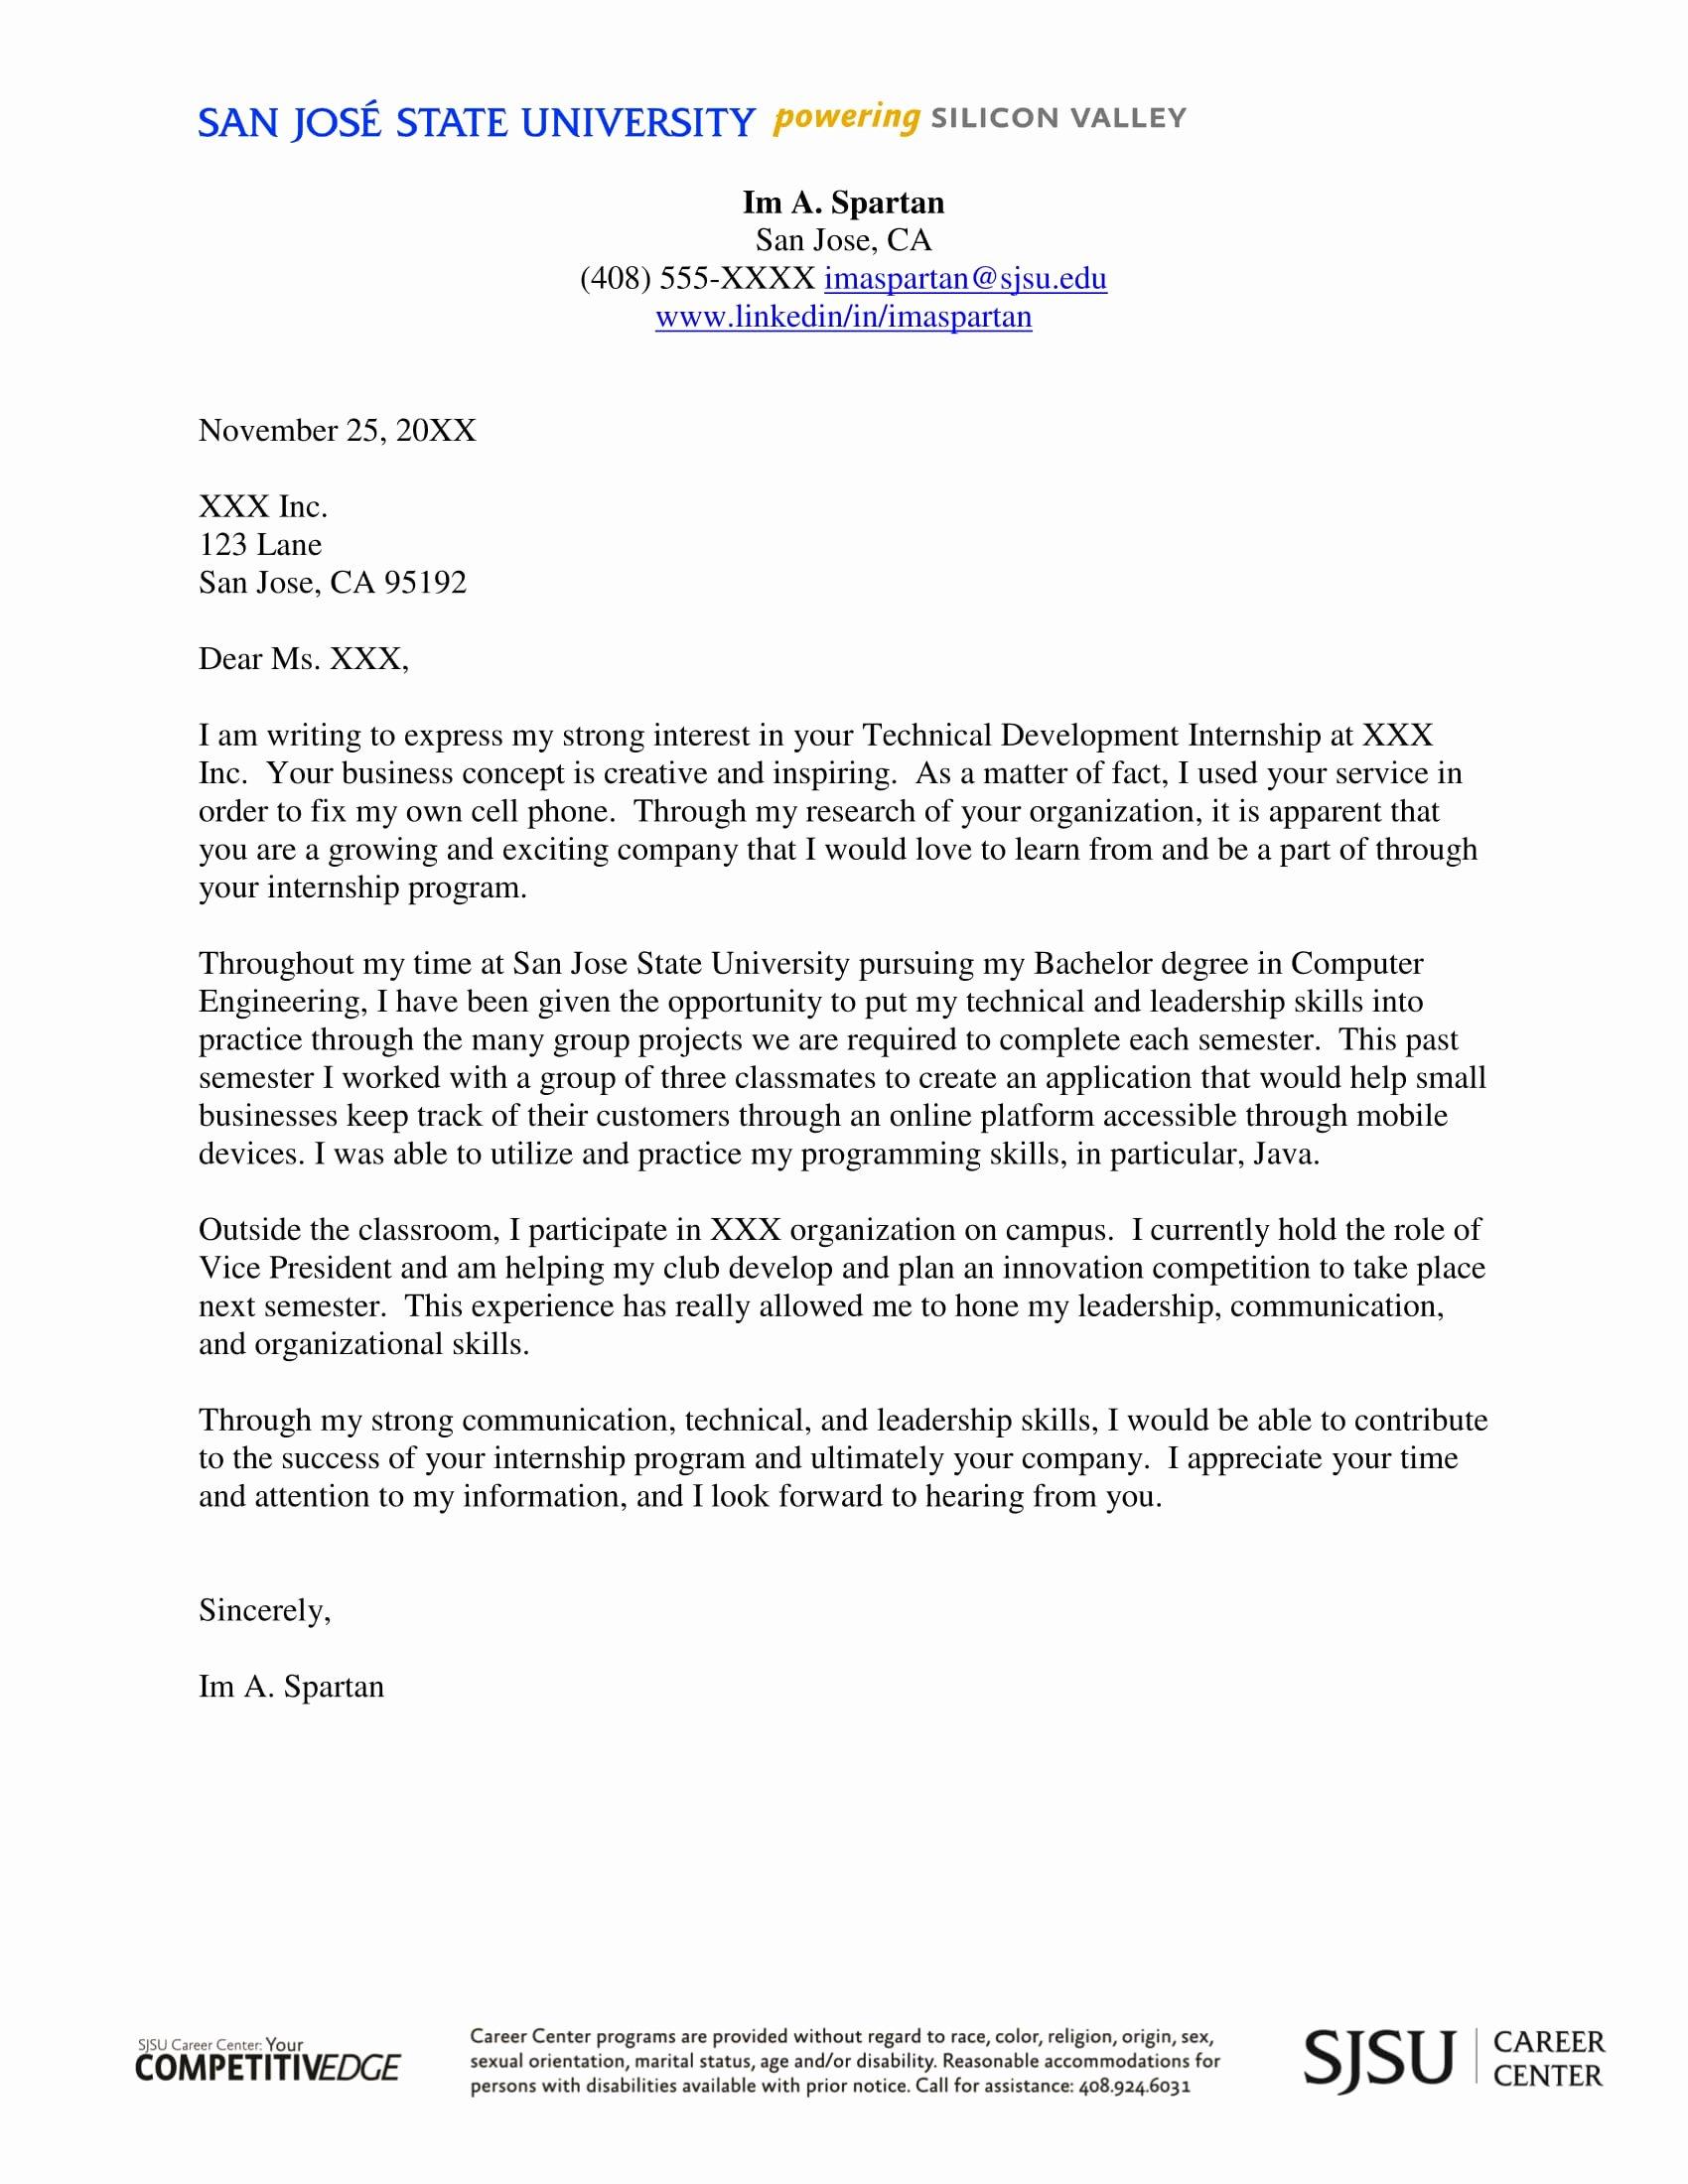 Cover Letter format Internship Beautiful 16 Best Cover Letter Samples for Internship Wisestep